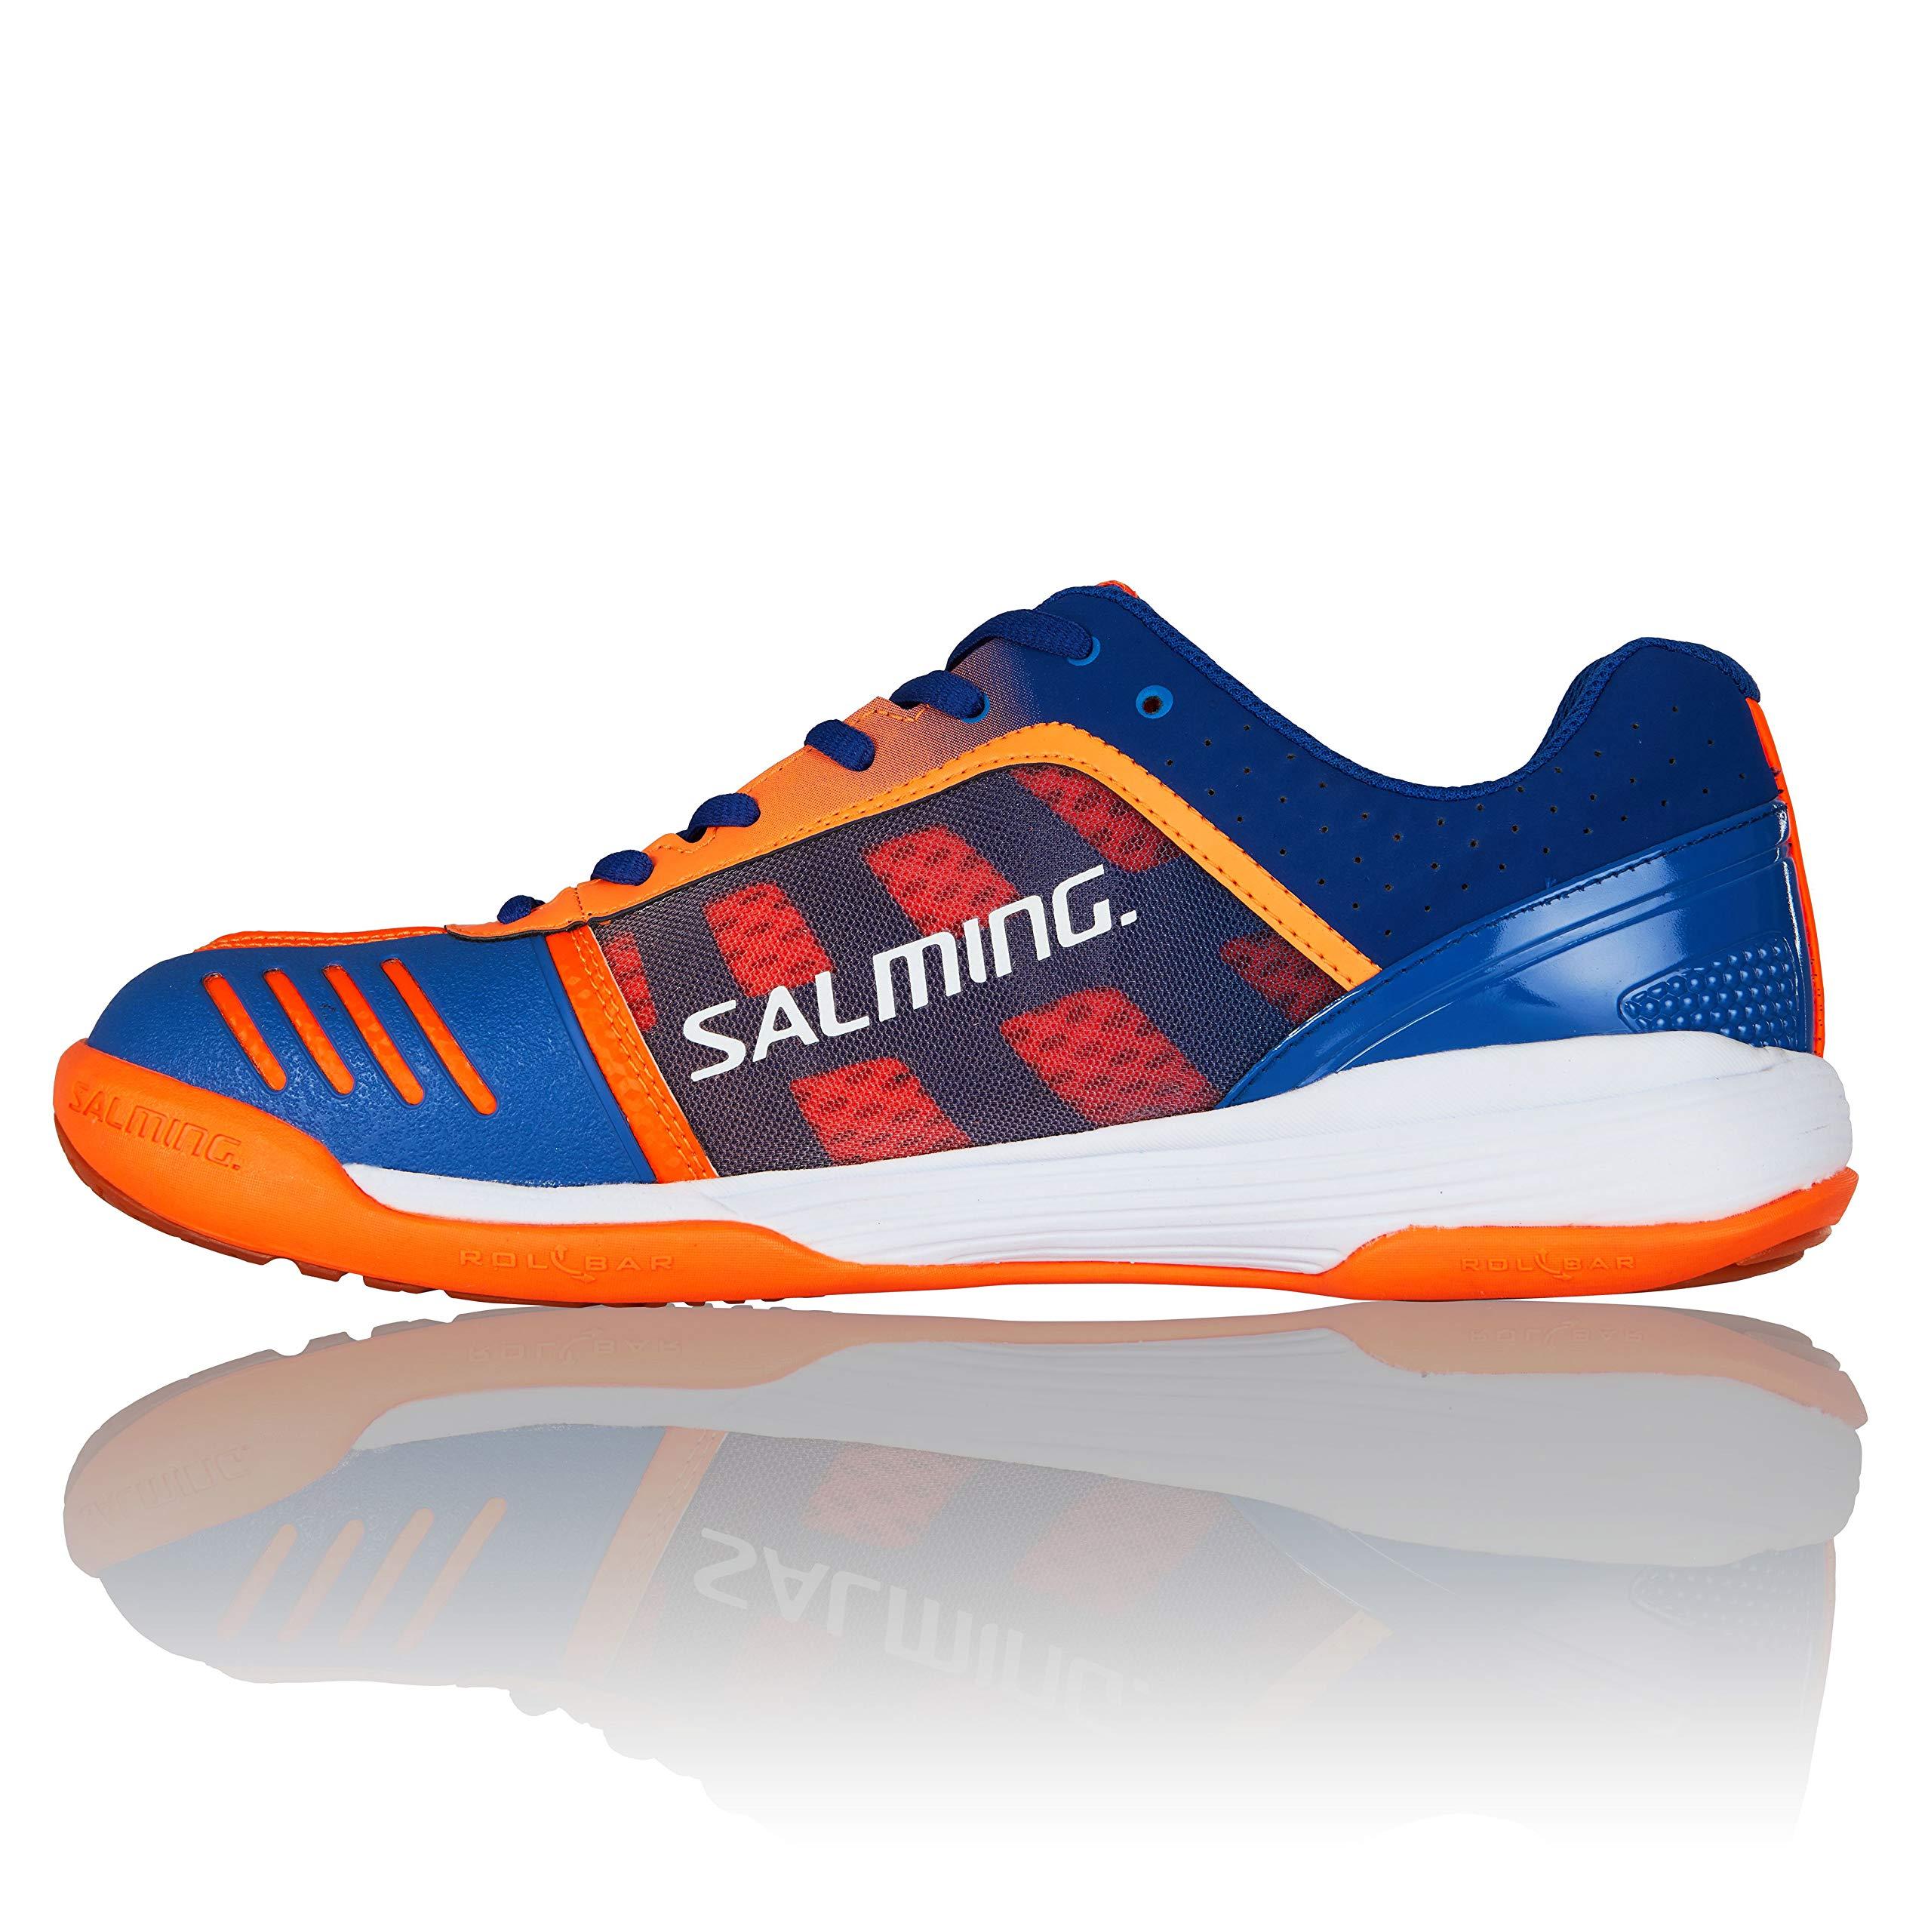 Salming Men's Falco Squash Indoor Court Sports Shoes, Limoges Blue/Orange Flame, 8